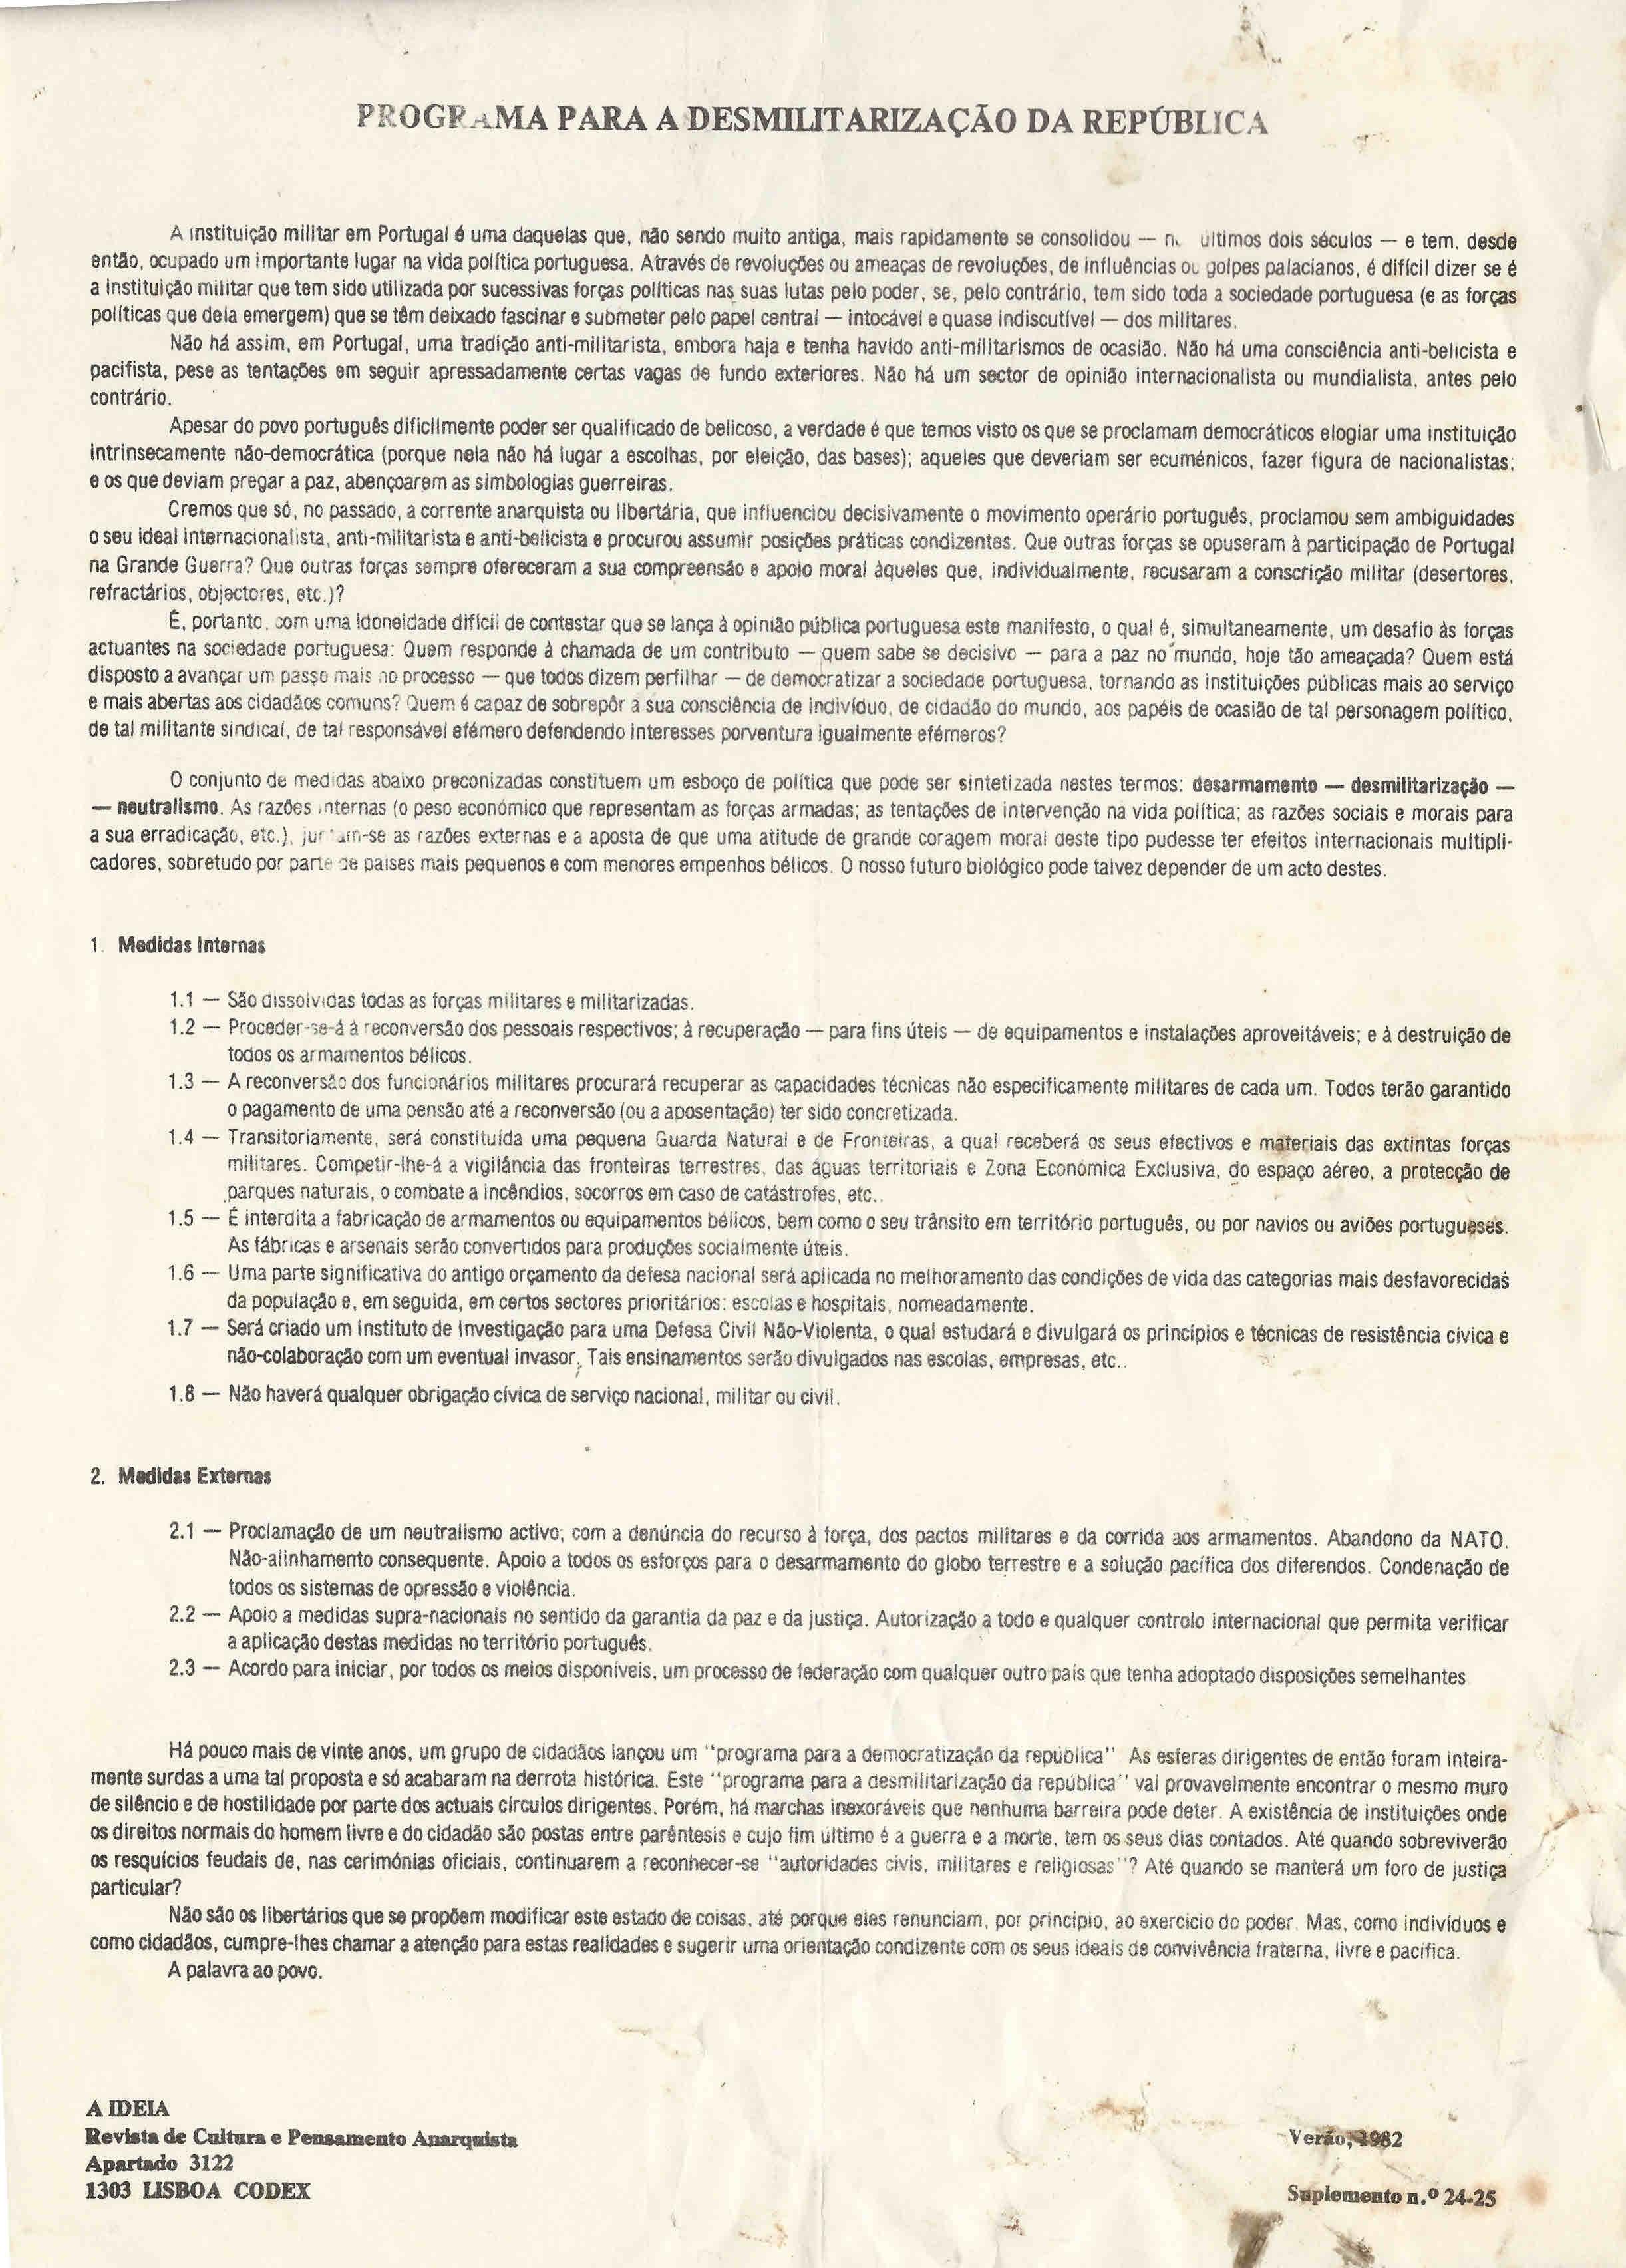 Copy of Scanner_20200314 (21)